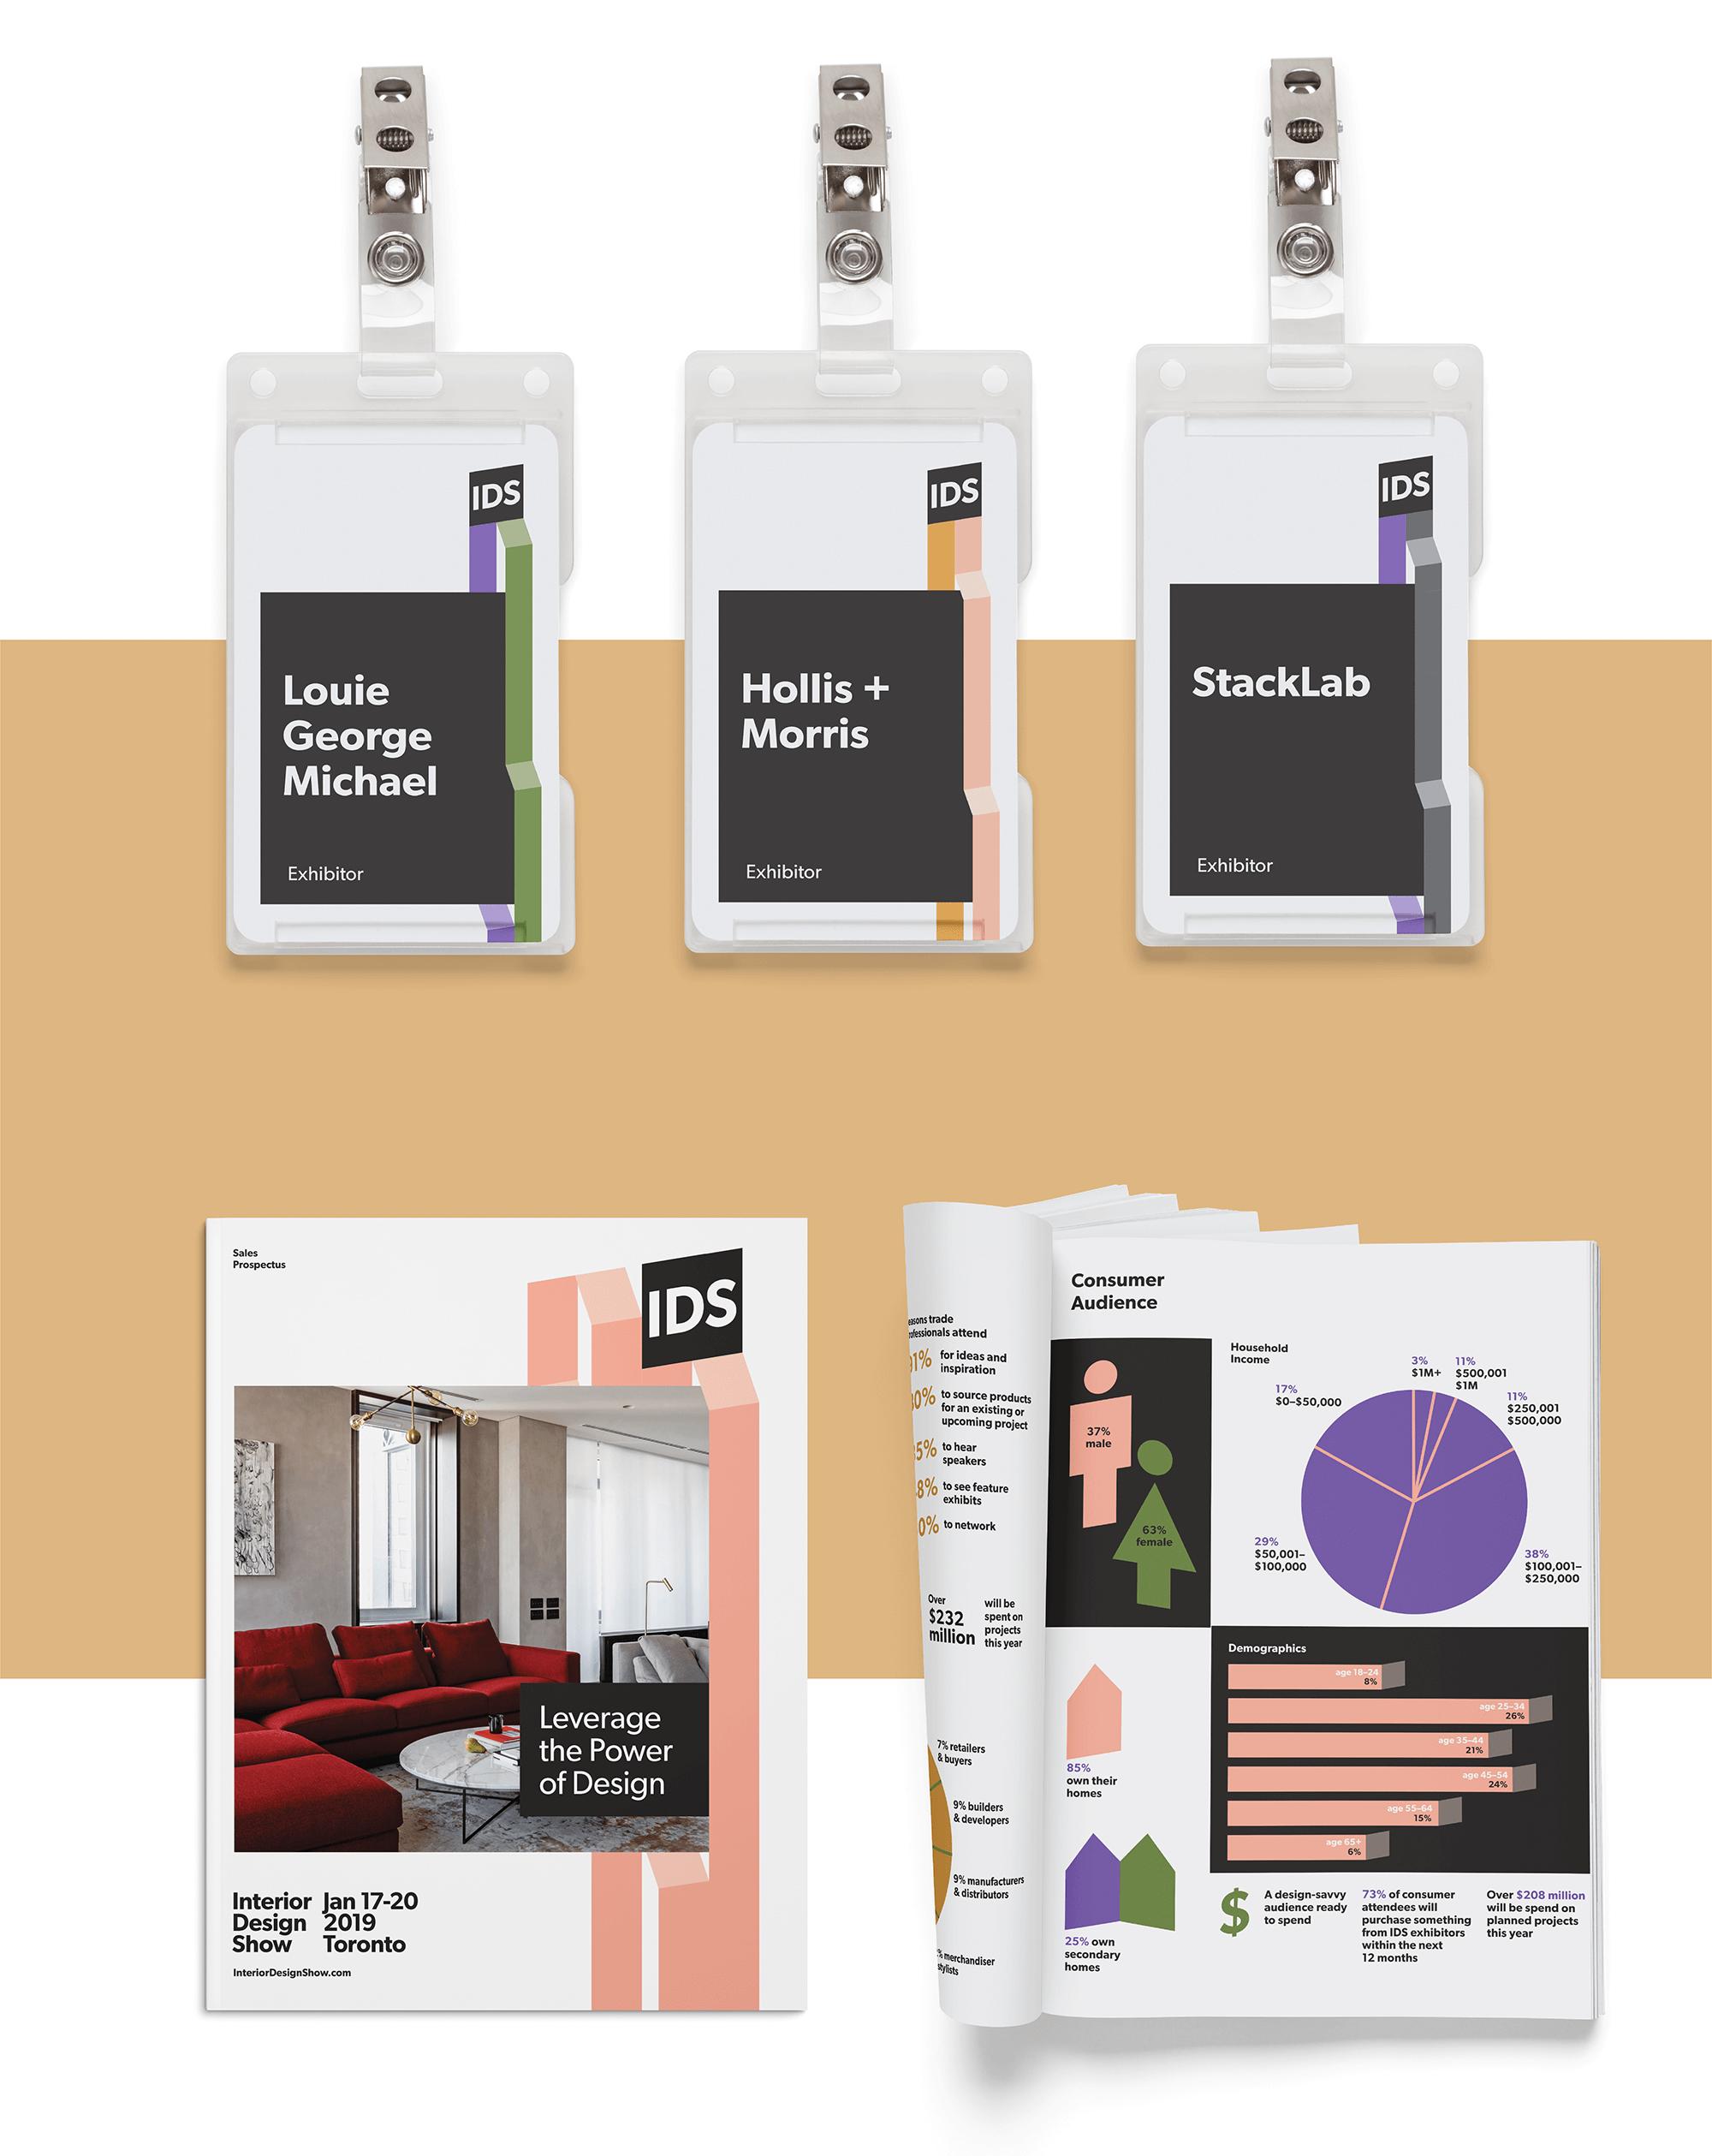 KatePeer_Designer_Strategist_London_England_Toronto_Branding_Editorial_Positioning_IDS-28.png